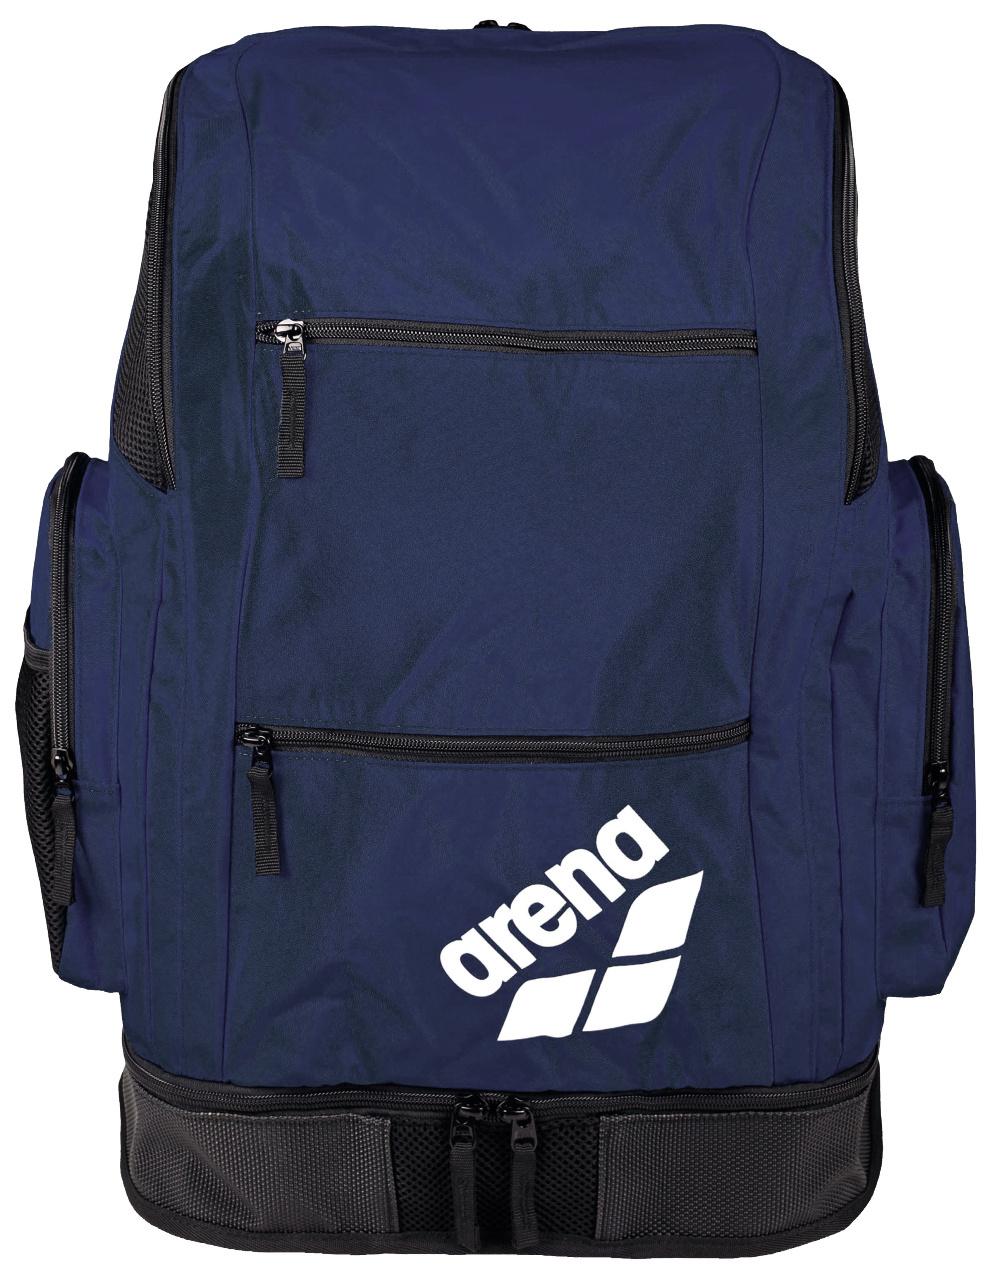 Johnson HS *SALE* Backpack